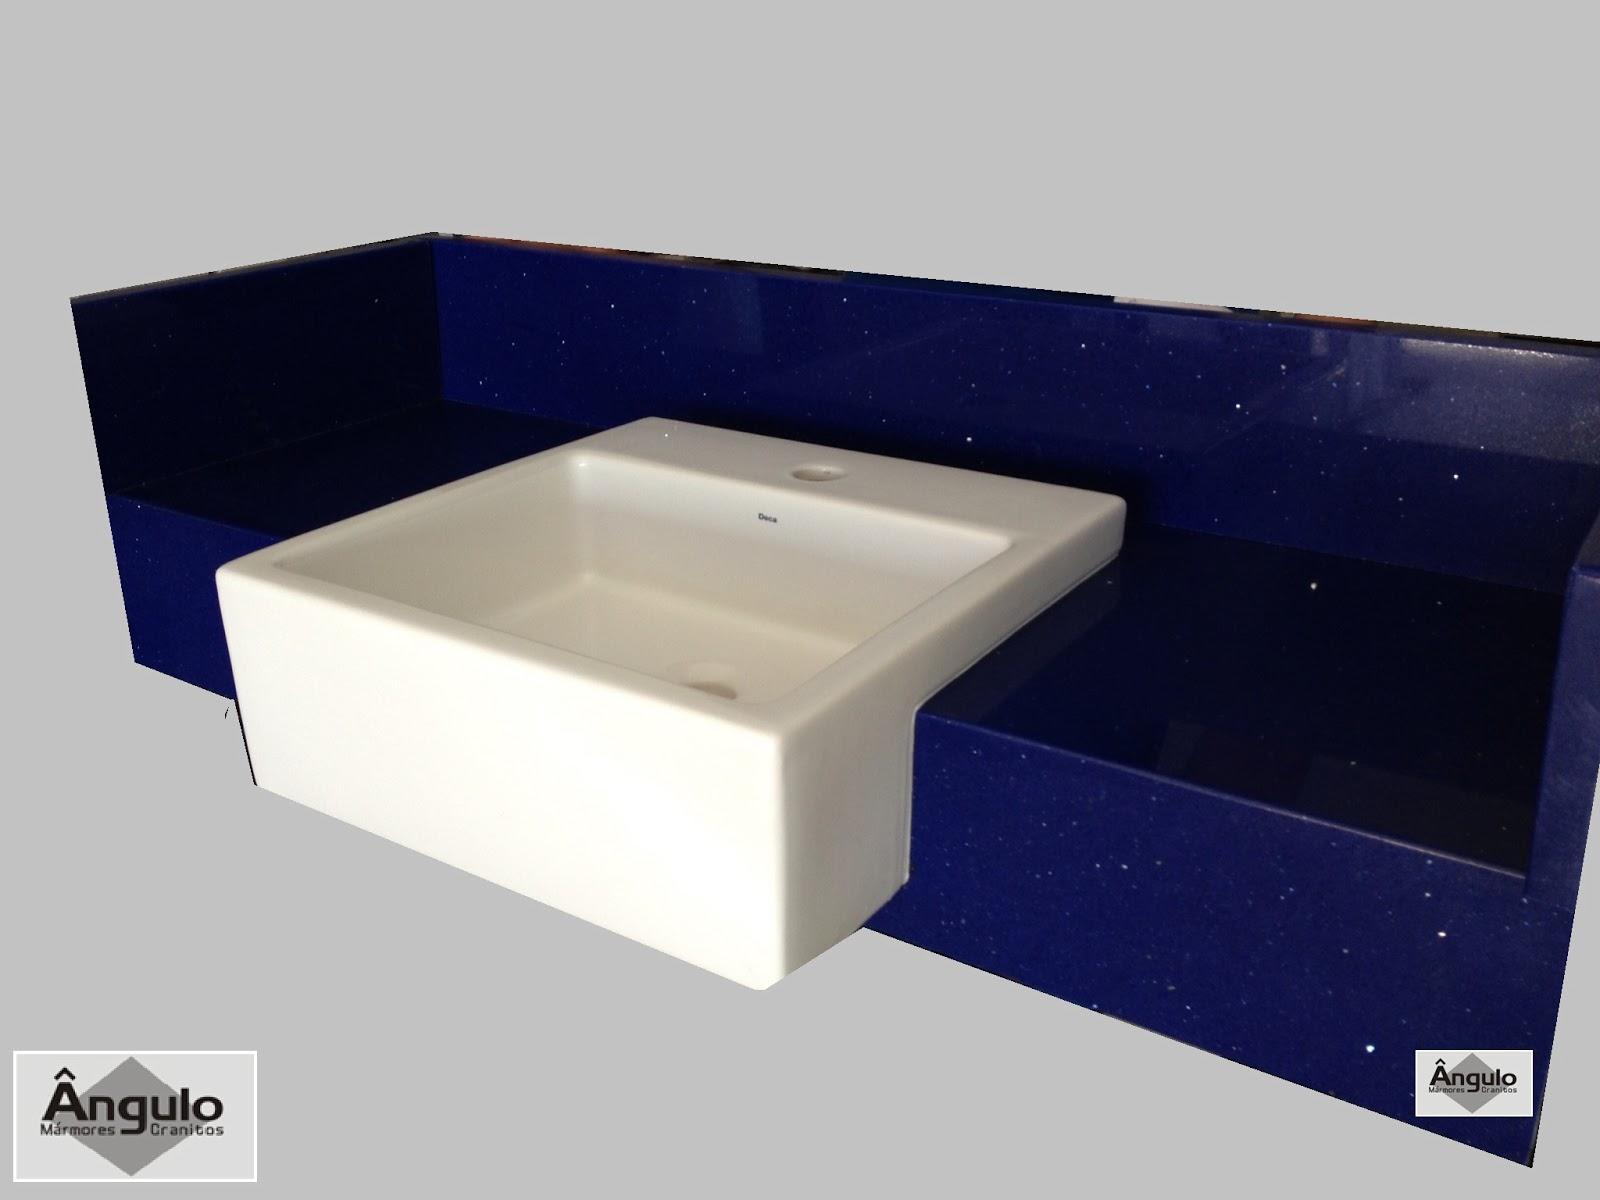 Bancada de banheiro em Silestone Azul Stellar. #0D0E31 1600x1200 Bancada Banheiro Silestone